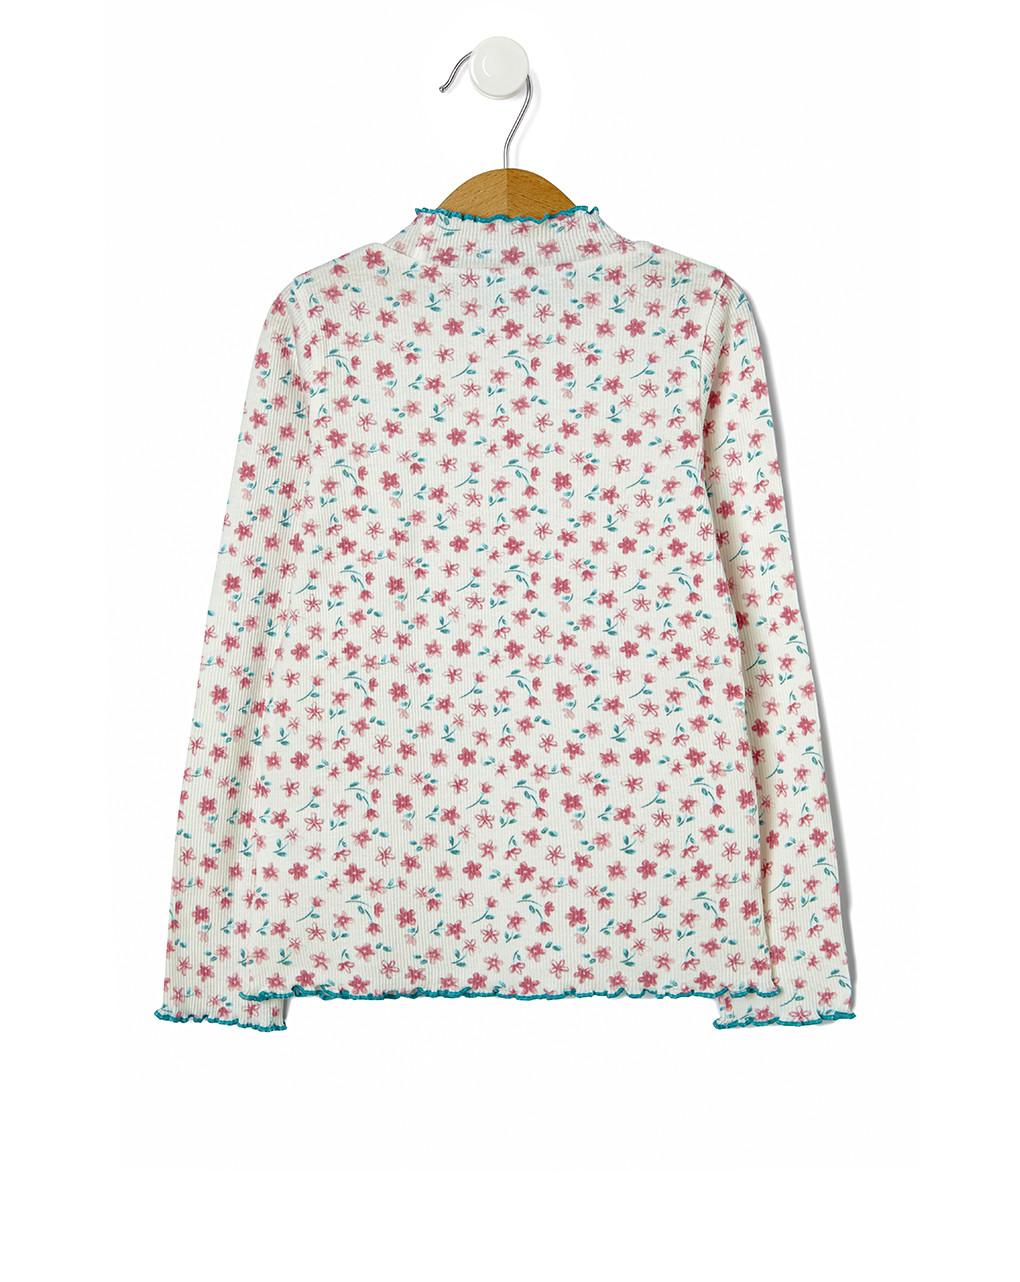 T-shirt costina con stampa fiori - Prénatal